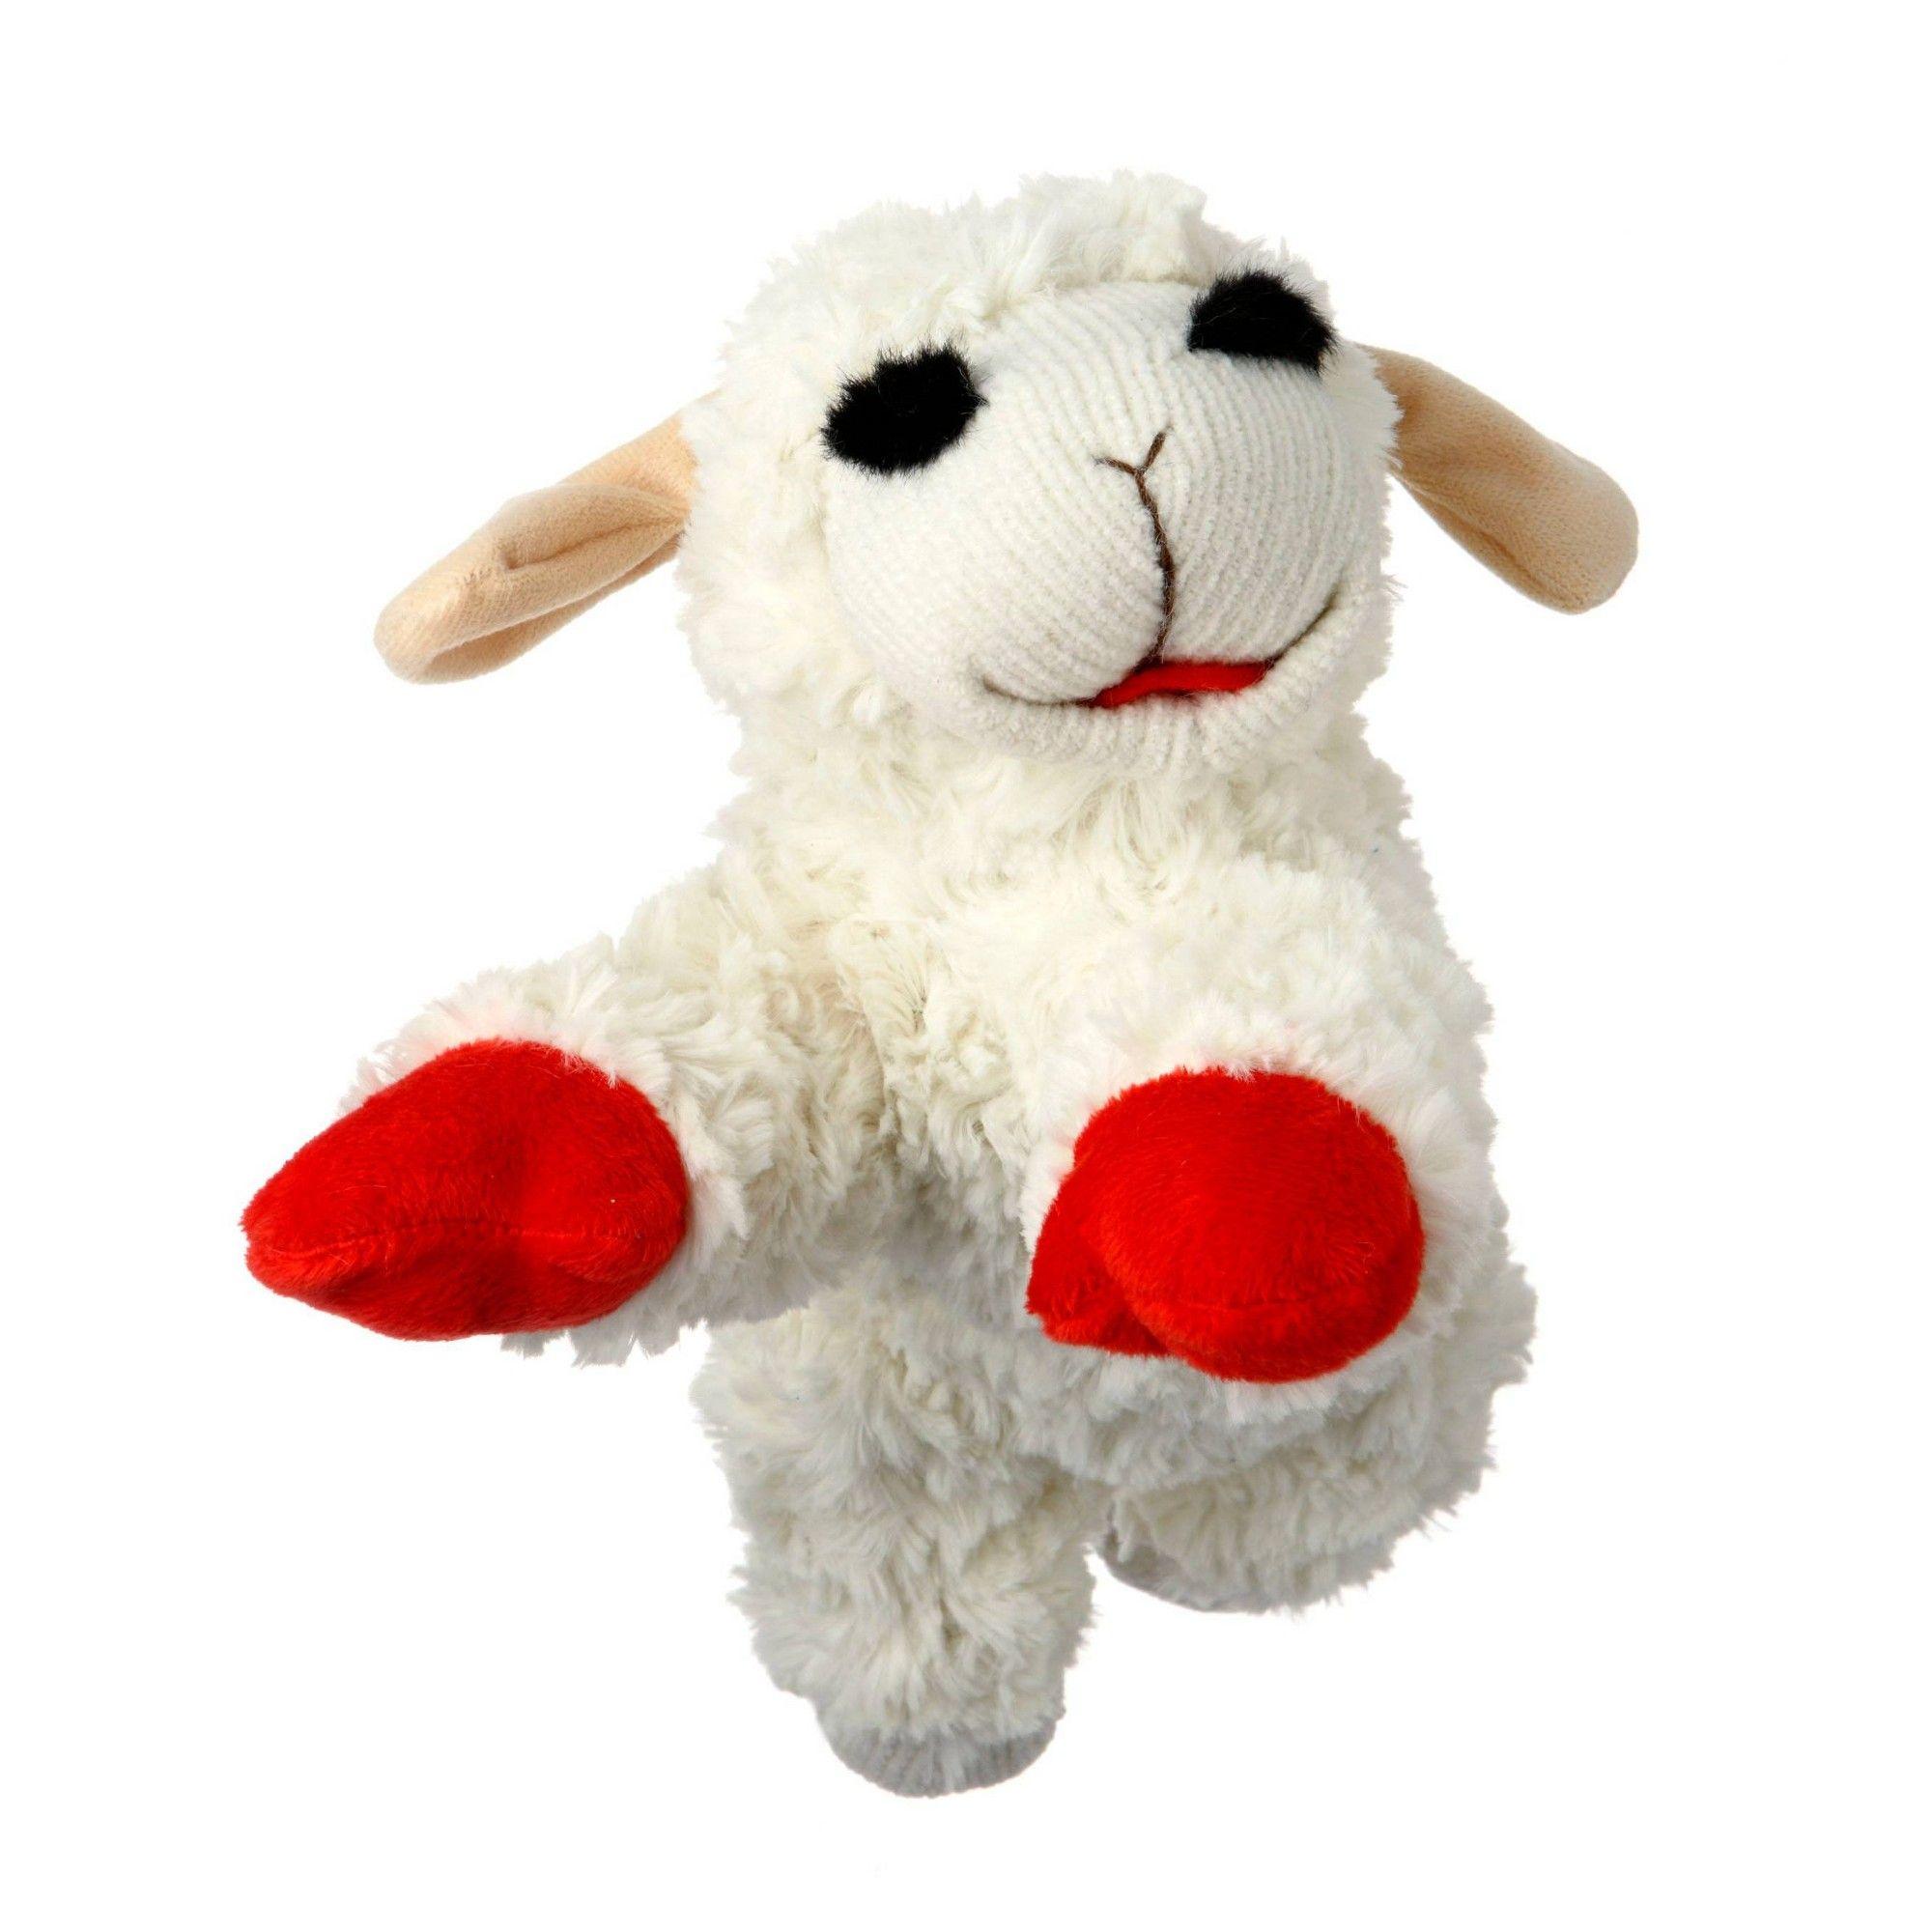 Multipet Lamb Chop Dog Toy 10 5 Plush Dog Toys Interactive